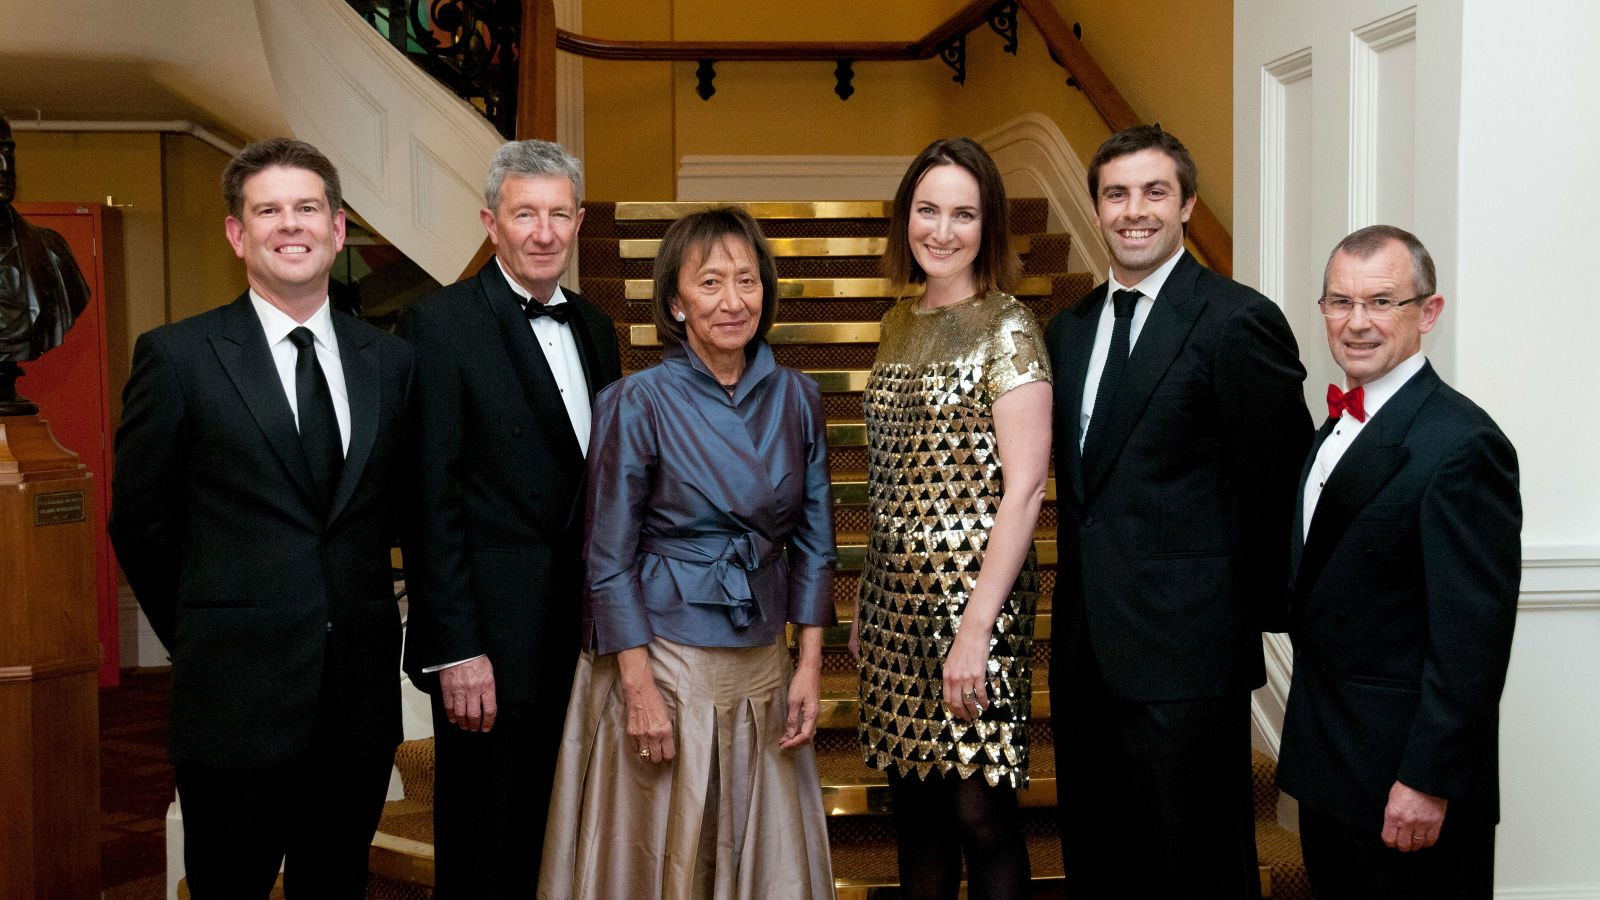 Distinguished Alumni Award winners from 2015